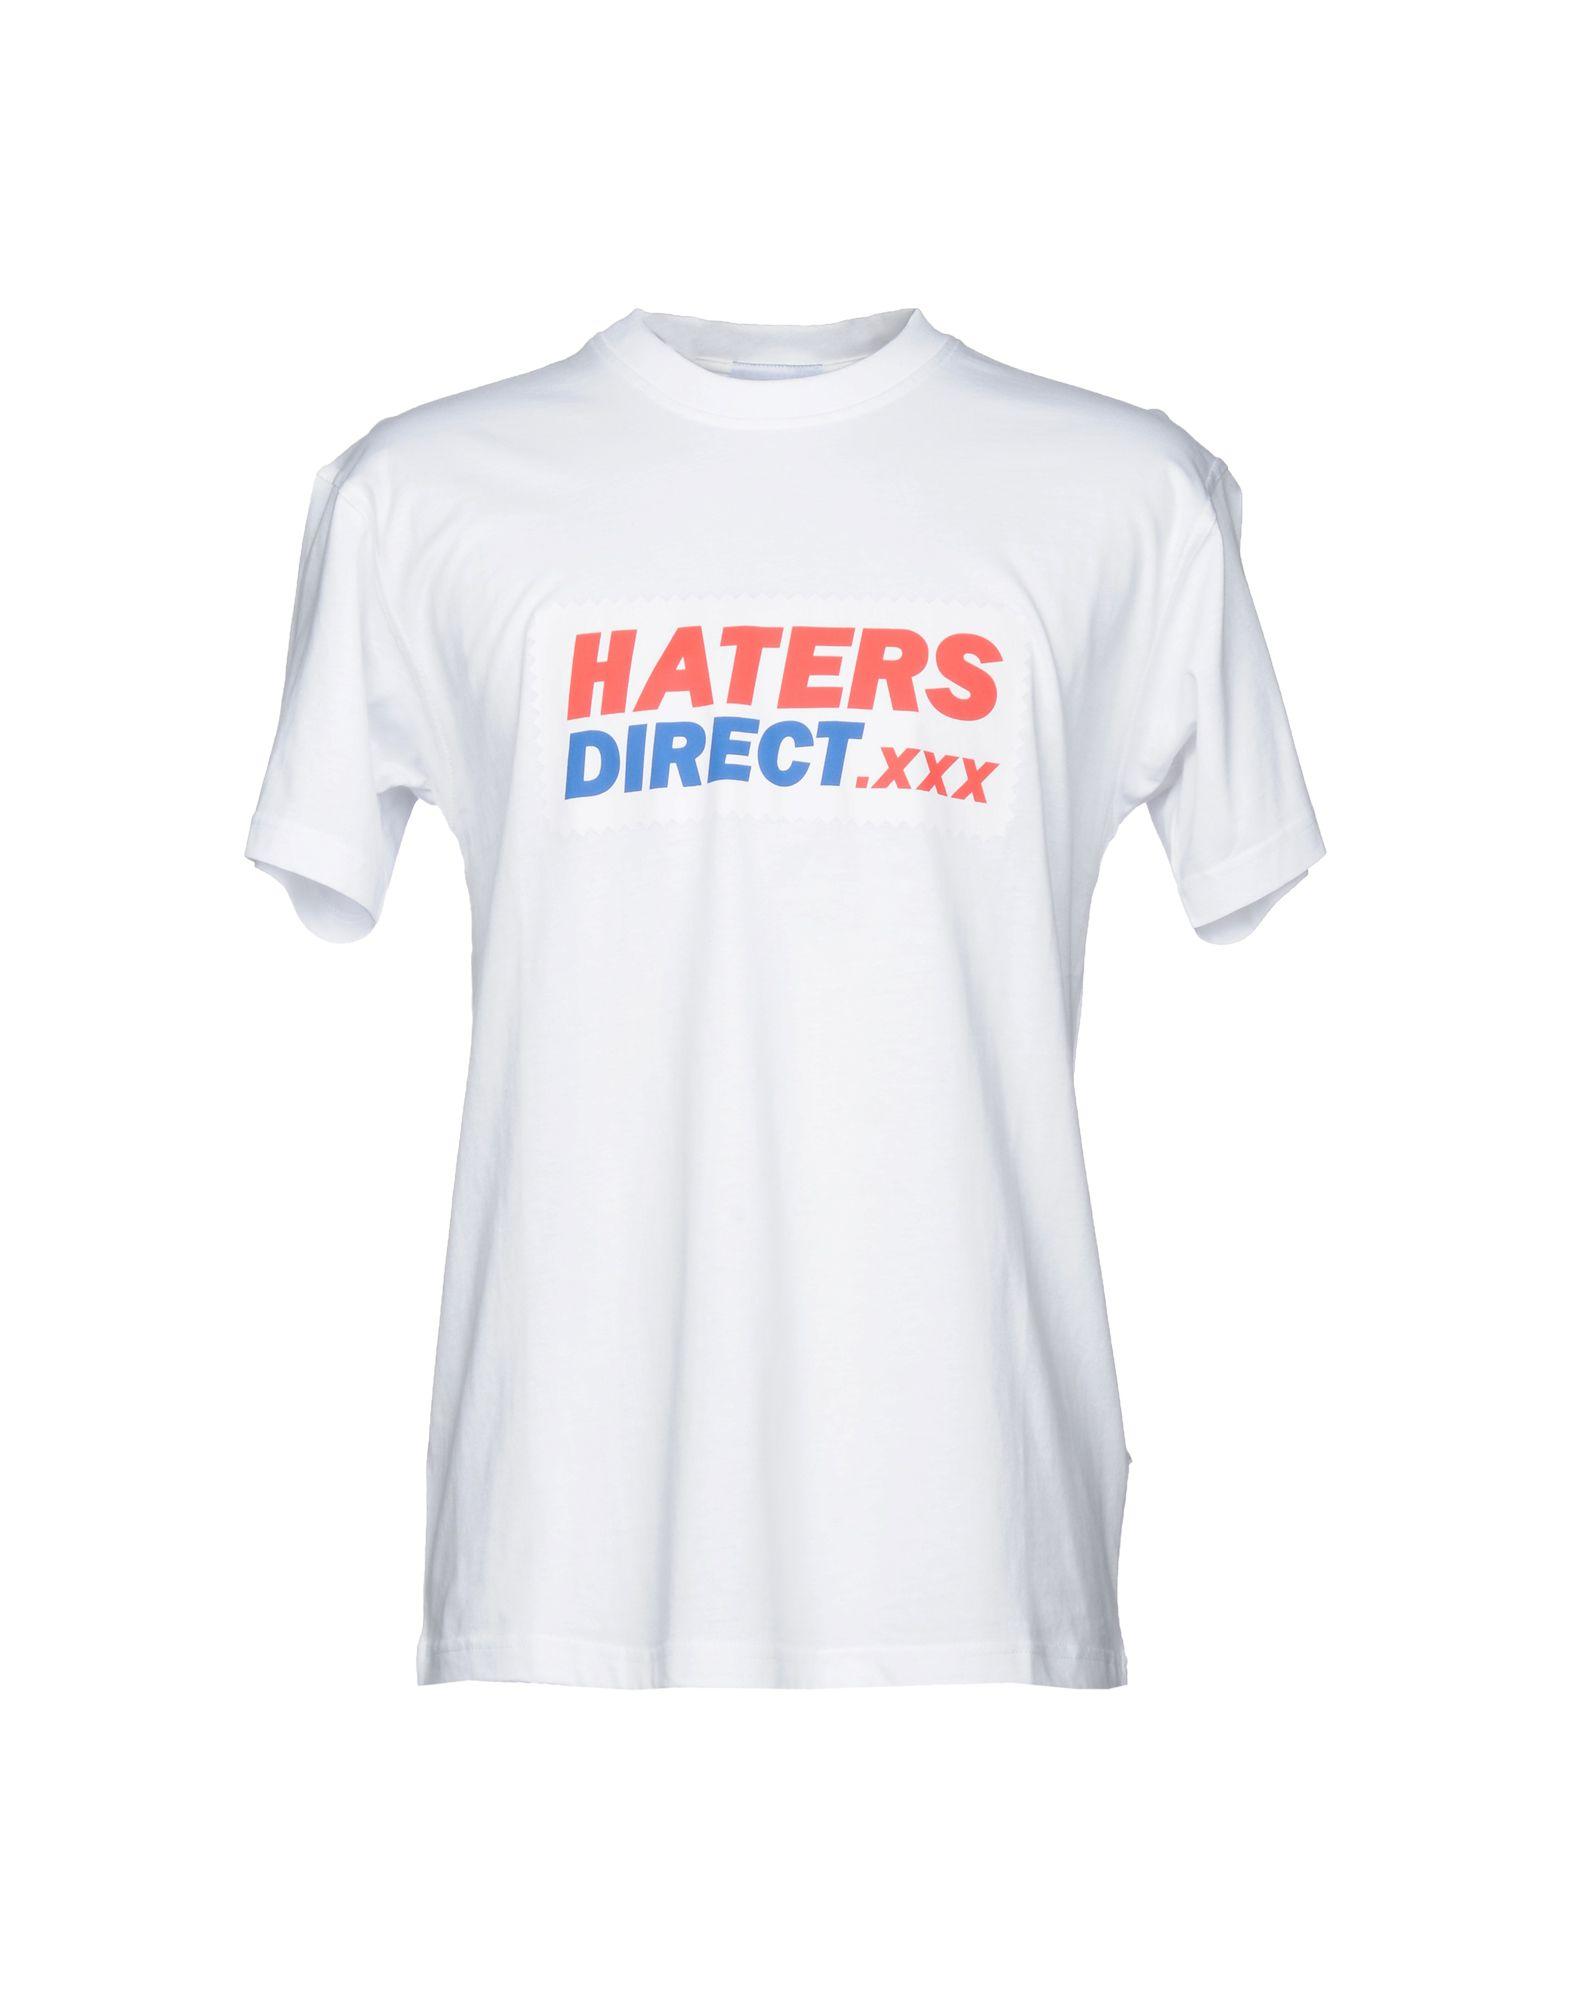 T-Shirt Christopher Shannon Shannon Christopher Uomo - 12137306CQ cbca5e